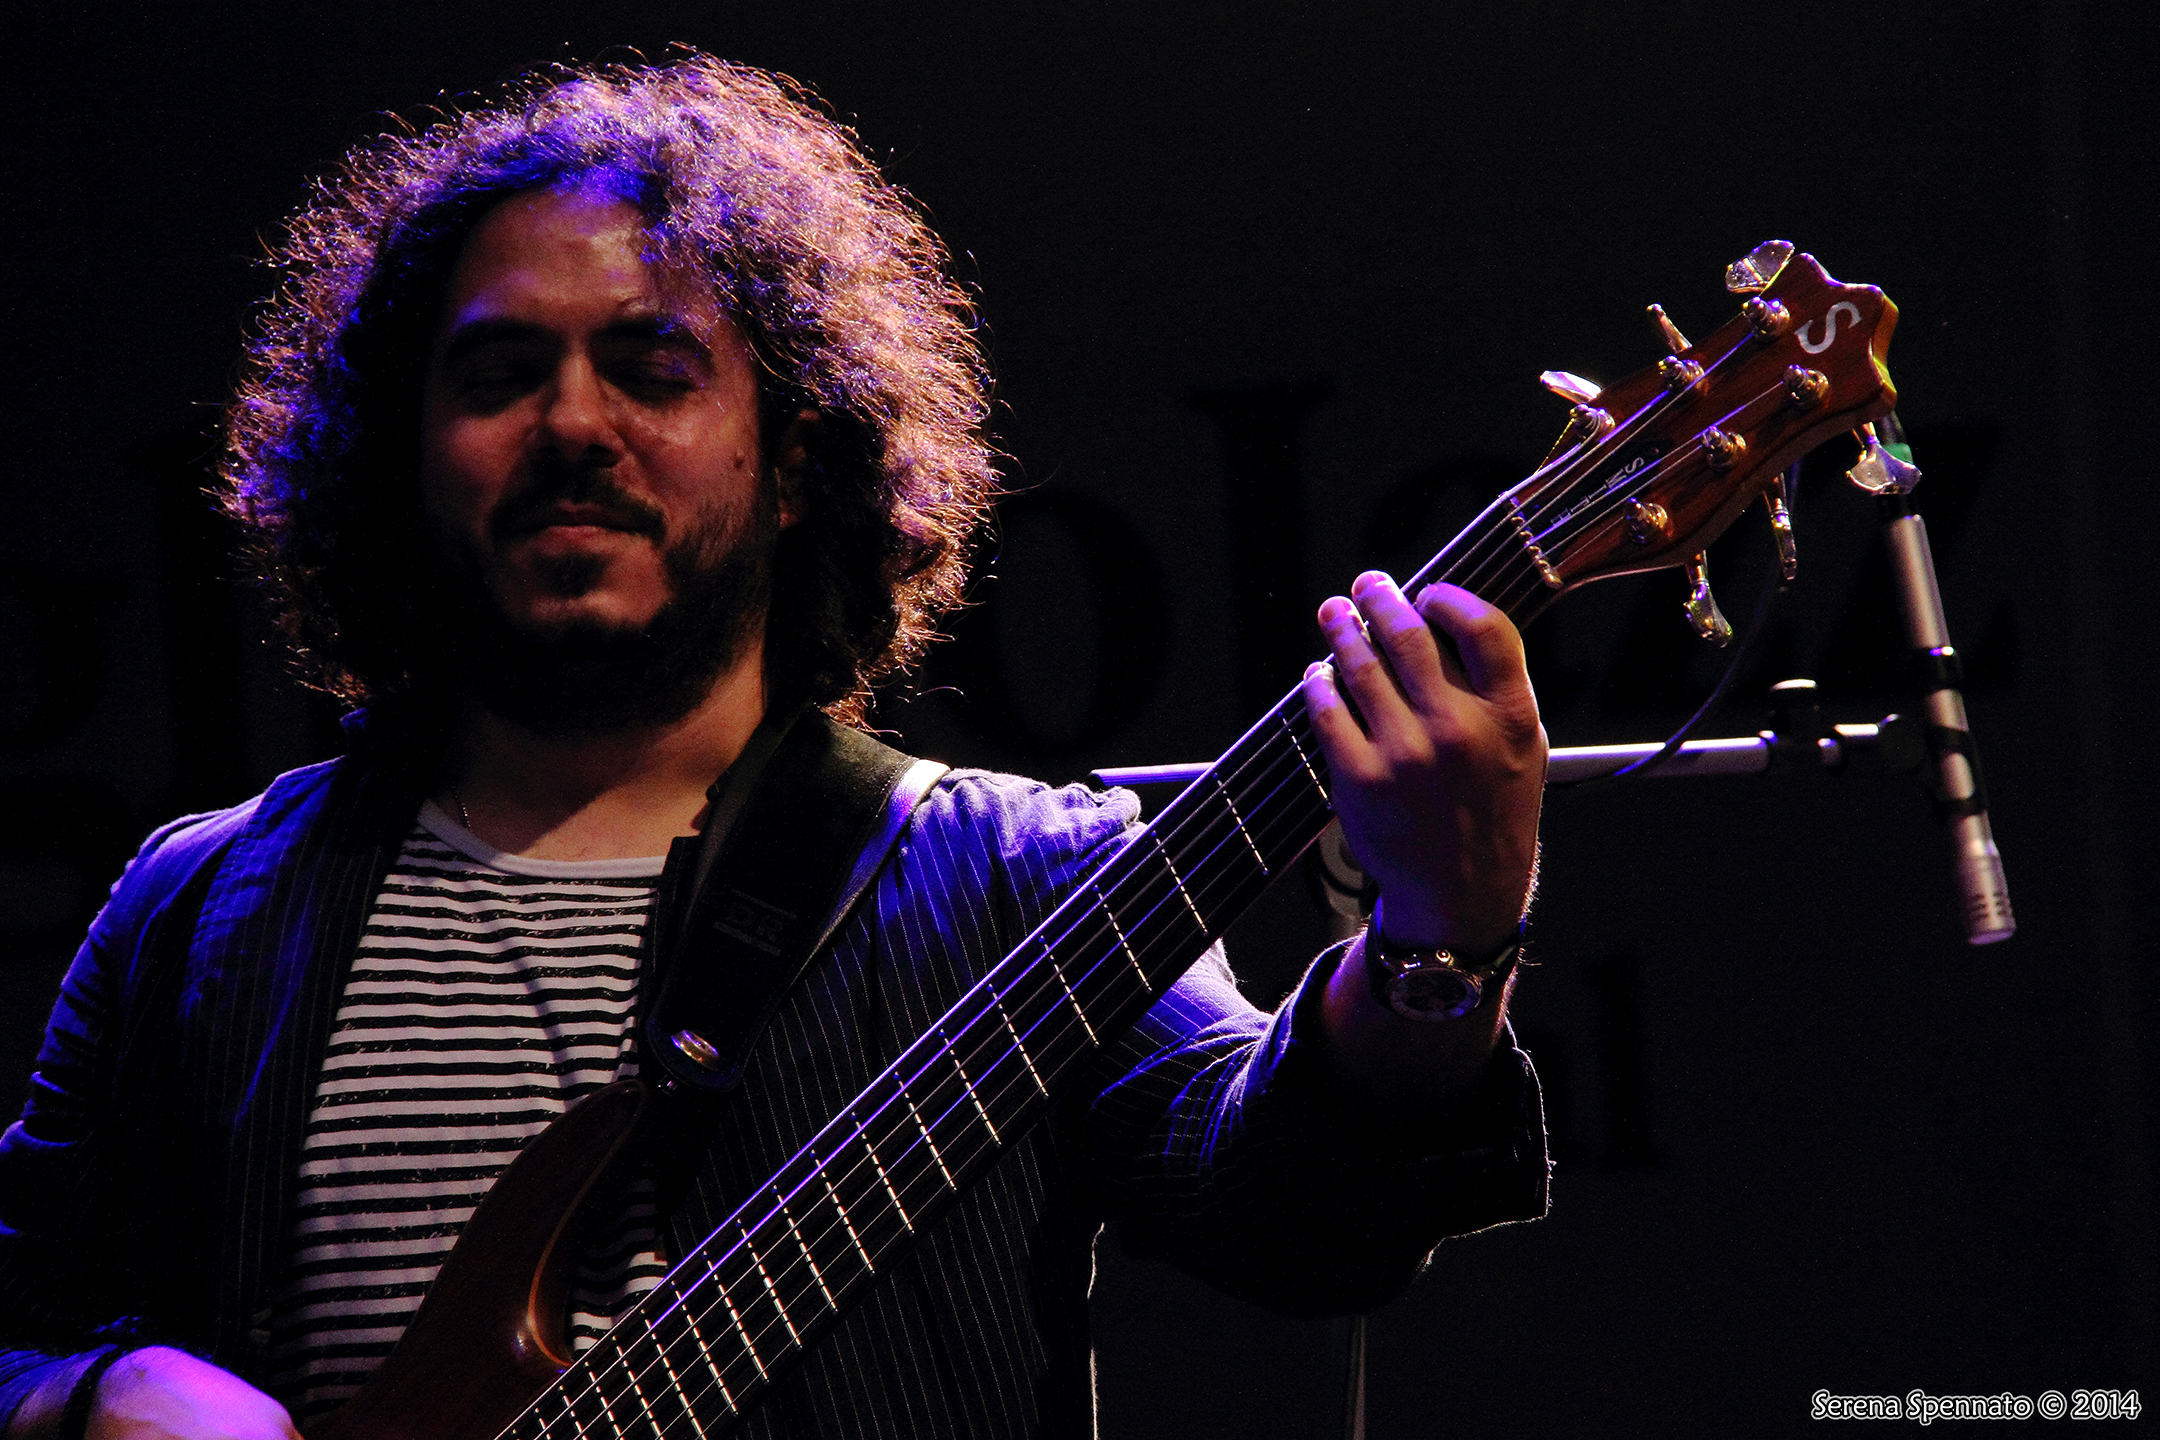 Pomigliano Jazz 2014 – Volcan: Rubalcaba, Hidalgo, Hernandez, Gola